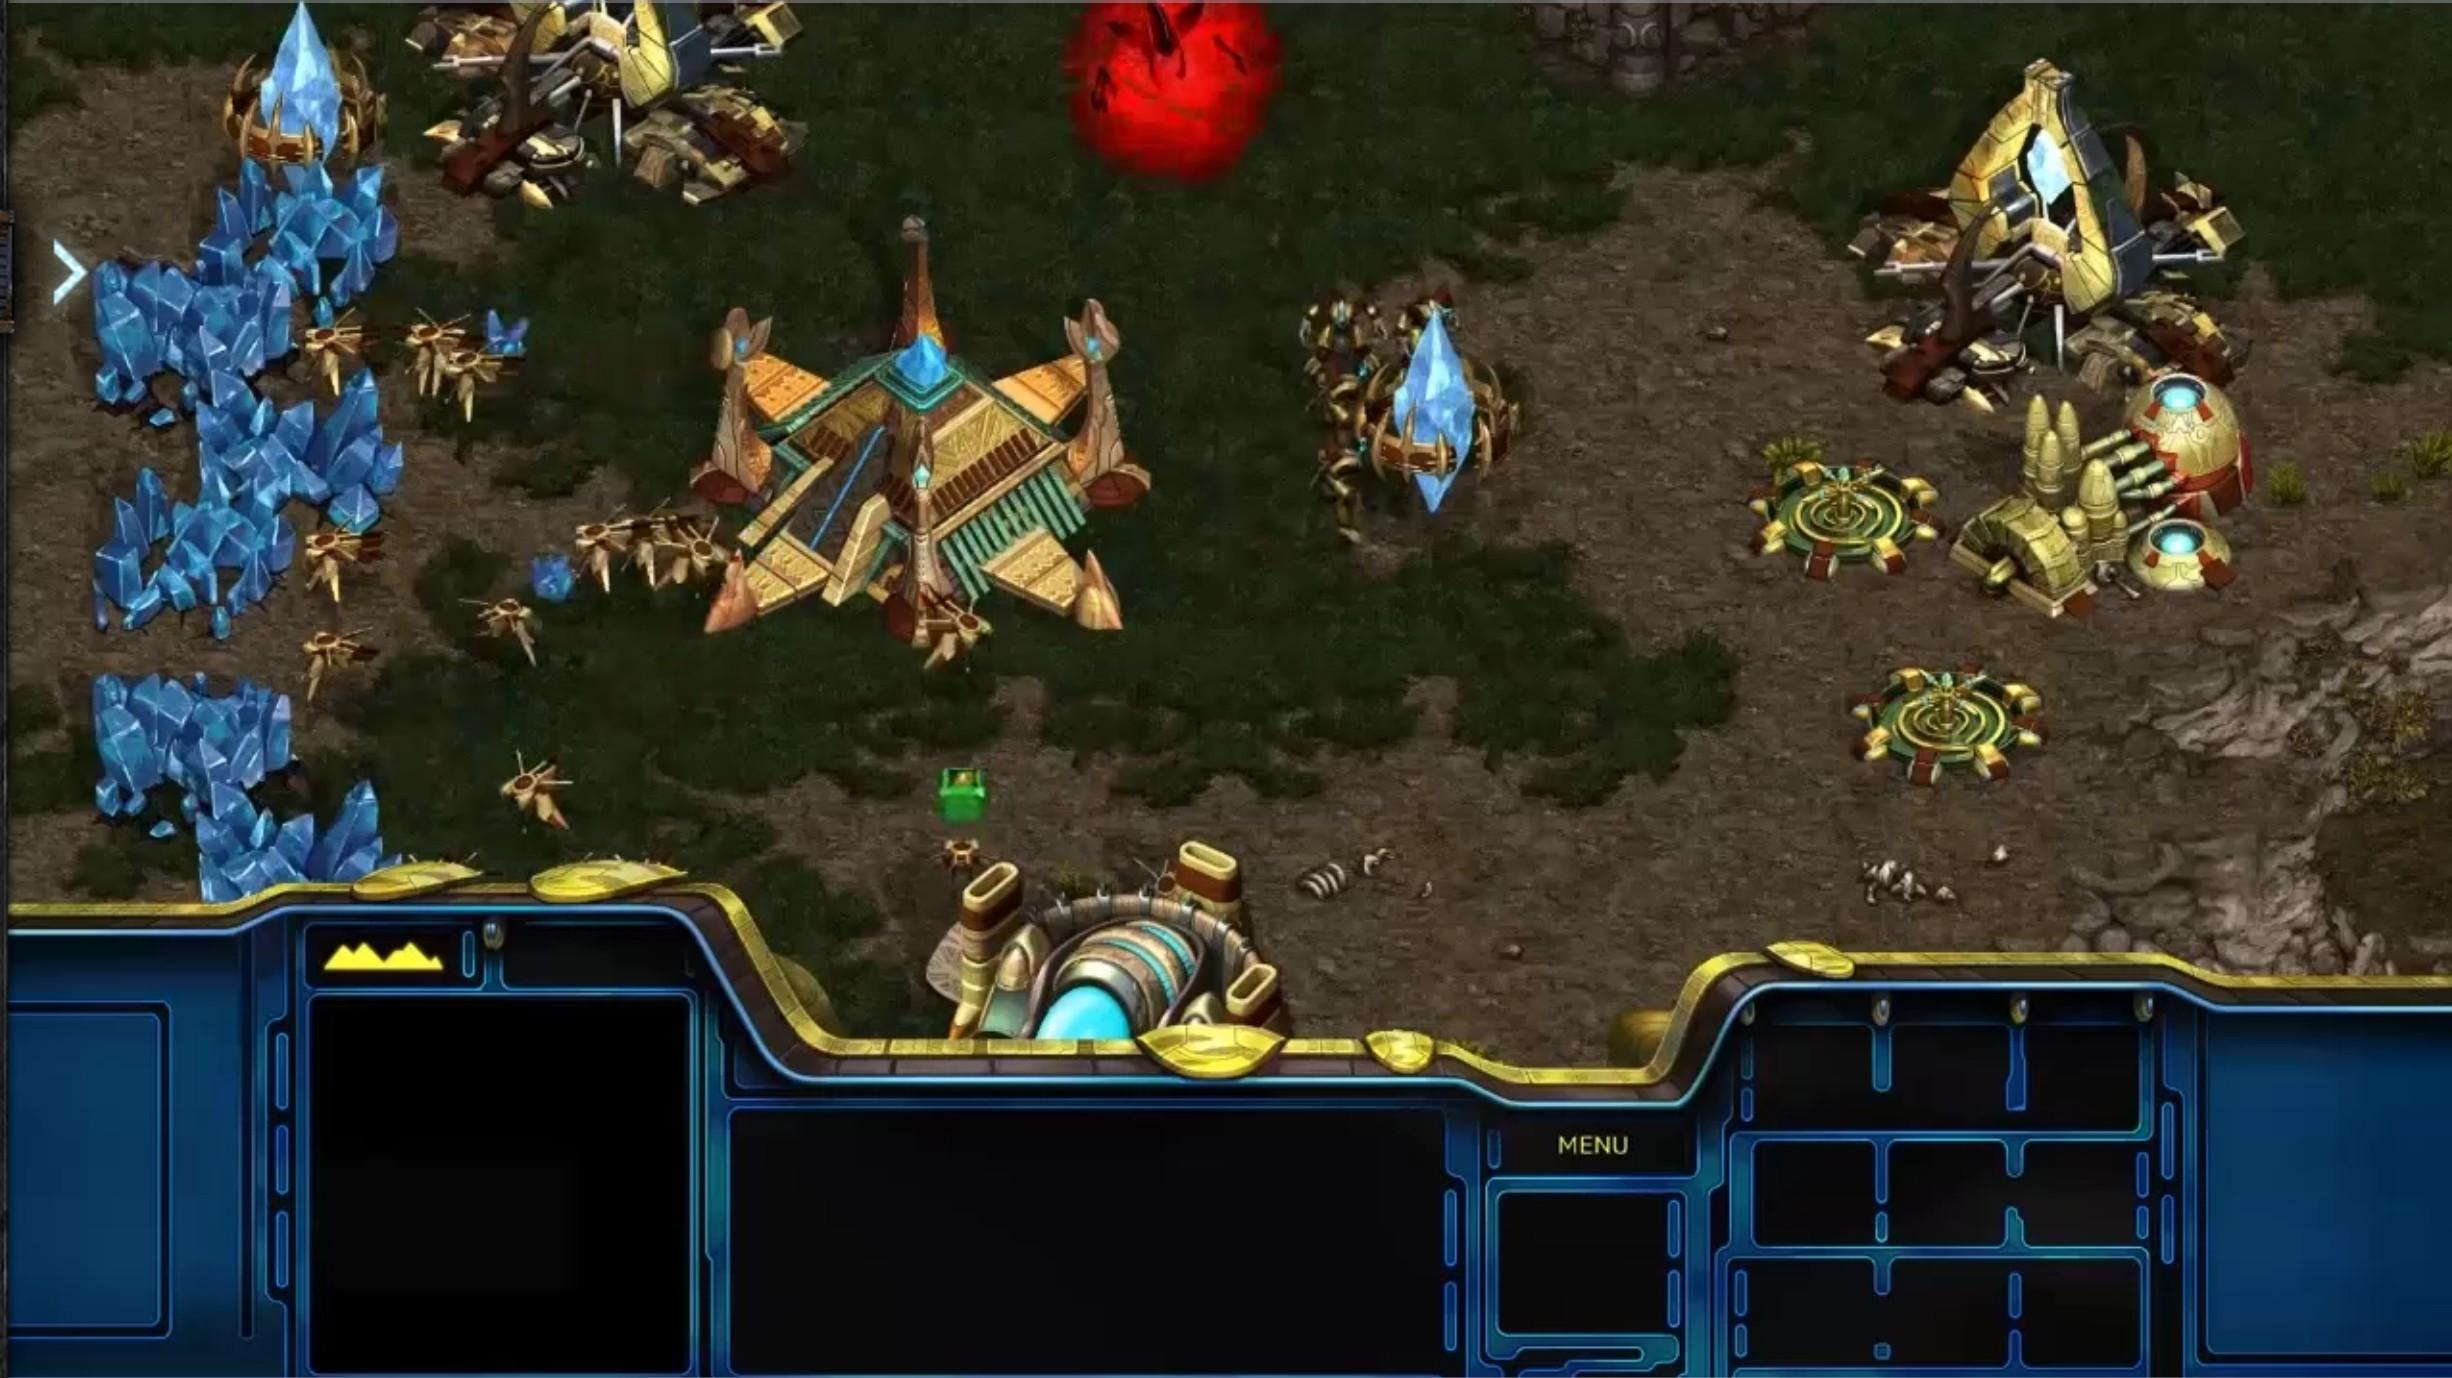 StarCraft: Remastered Battle net CD Key GLOBAL - Battle net - IGVault